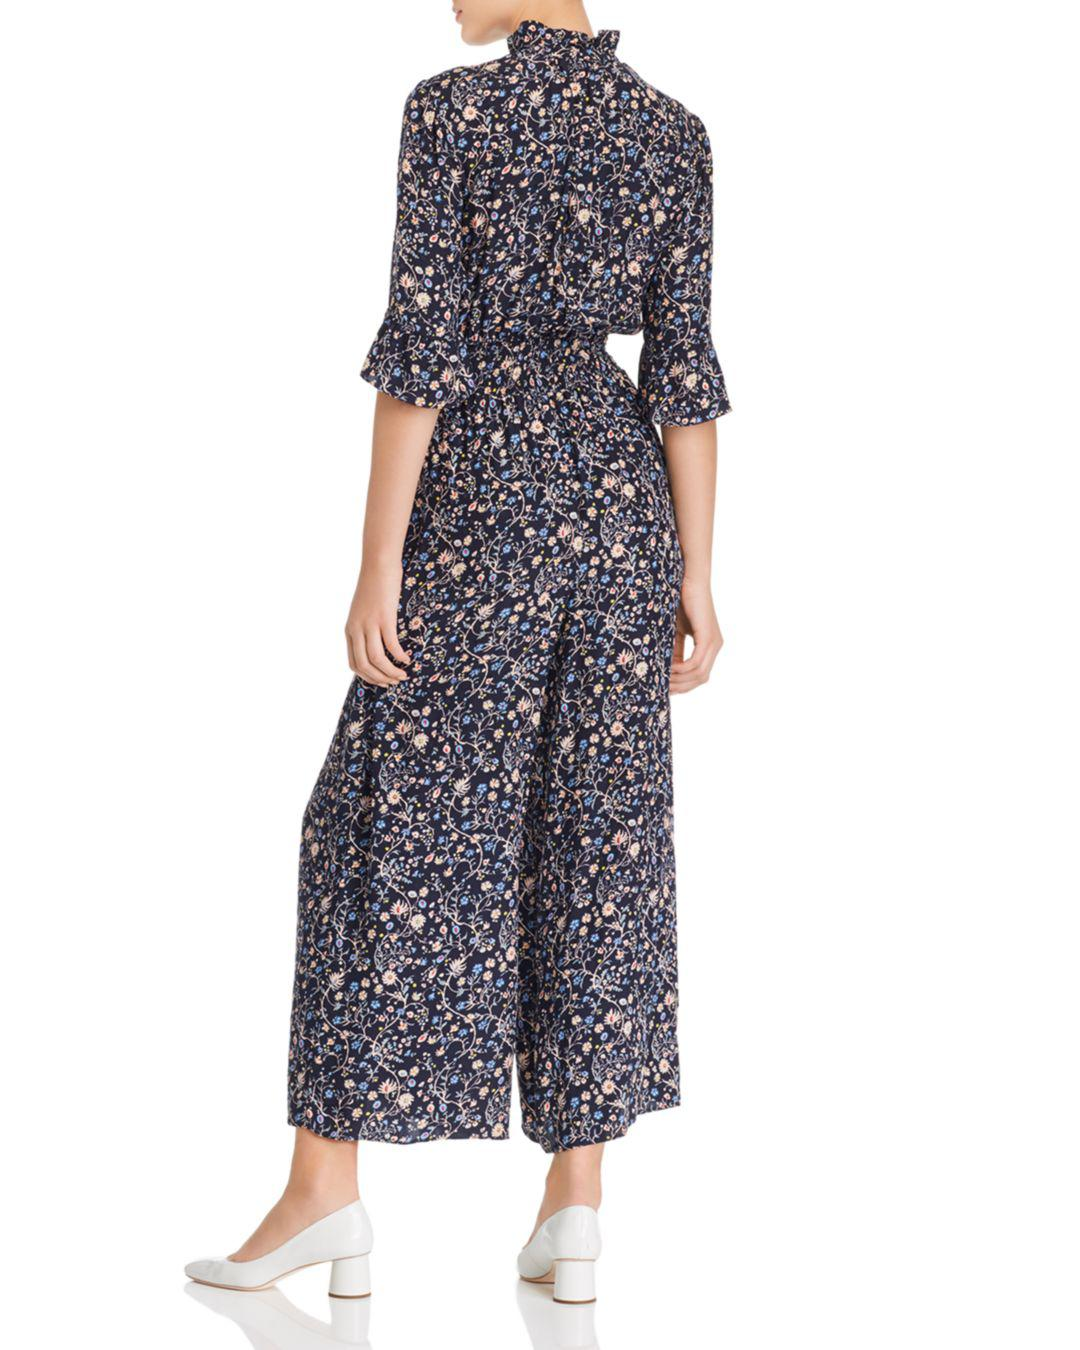 8bcbf15ebd Lyst - Rebecca Taylor Vivianna Vine Jacquard Silk Jumpsuit in Blue - Save  40%